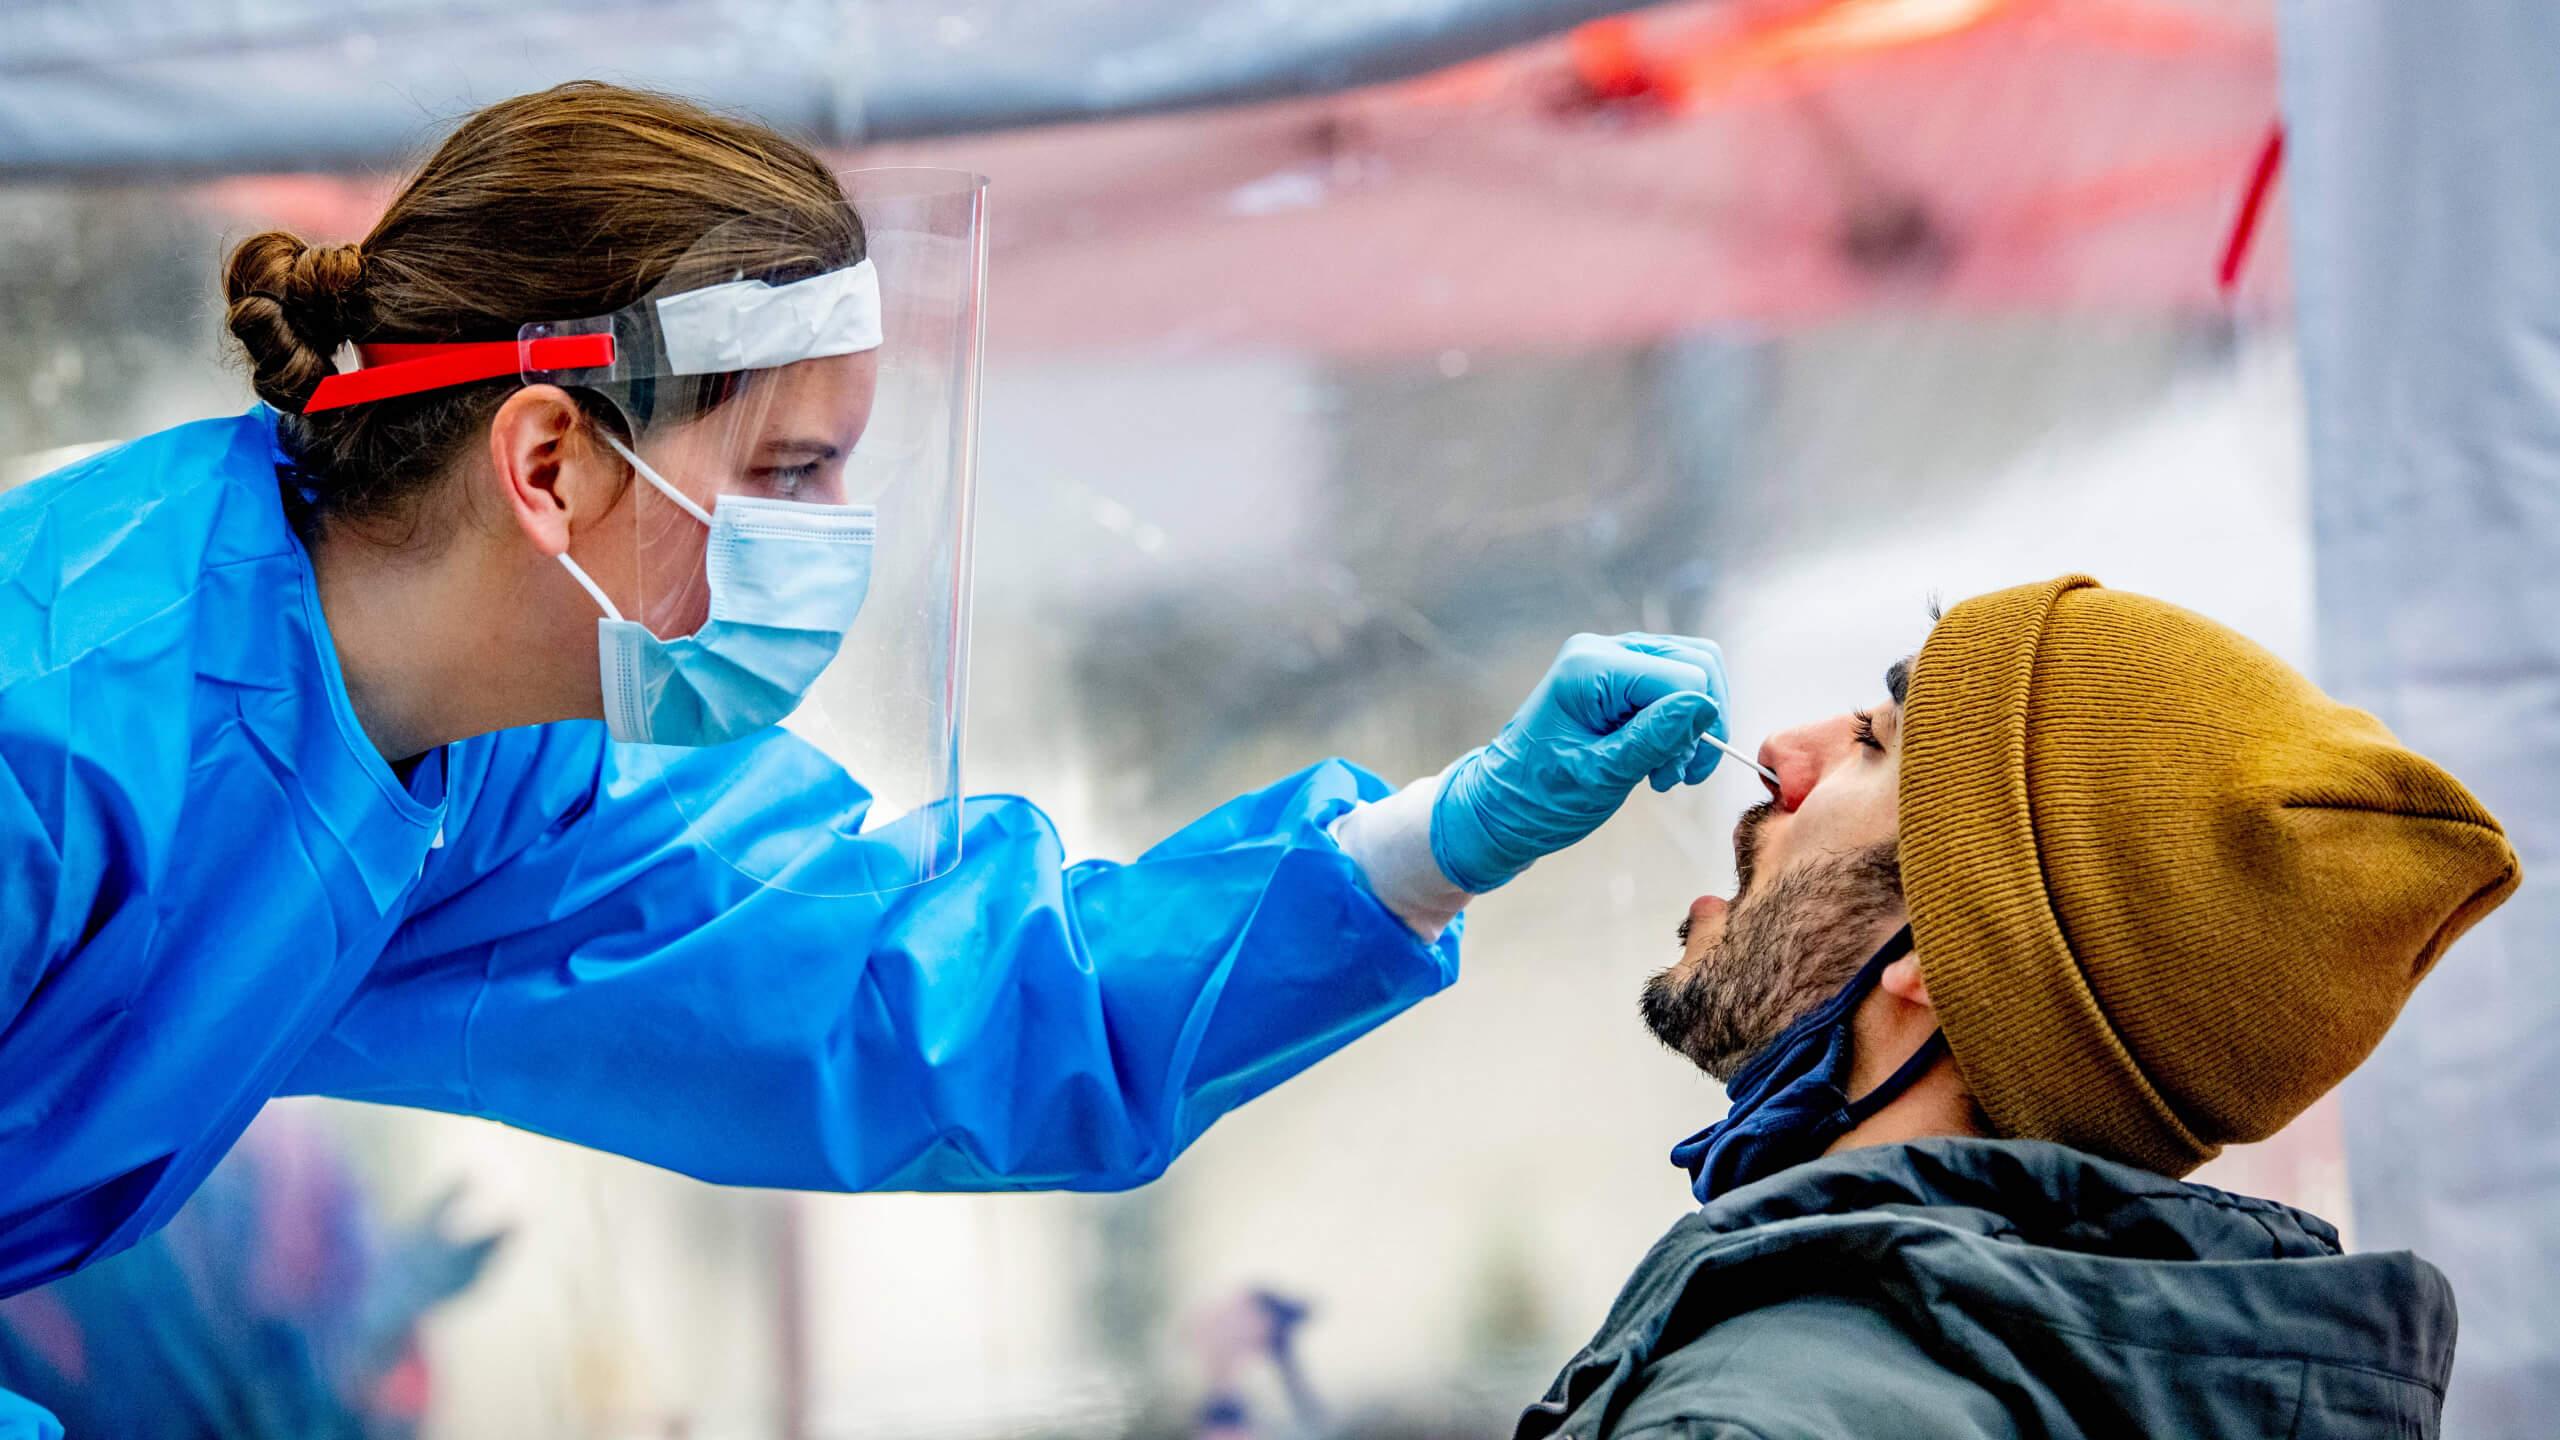 Falsch-positive Corona-Tests: Doch, die Inzidenz kann unter 100 sinken